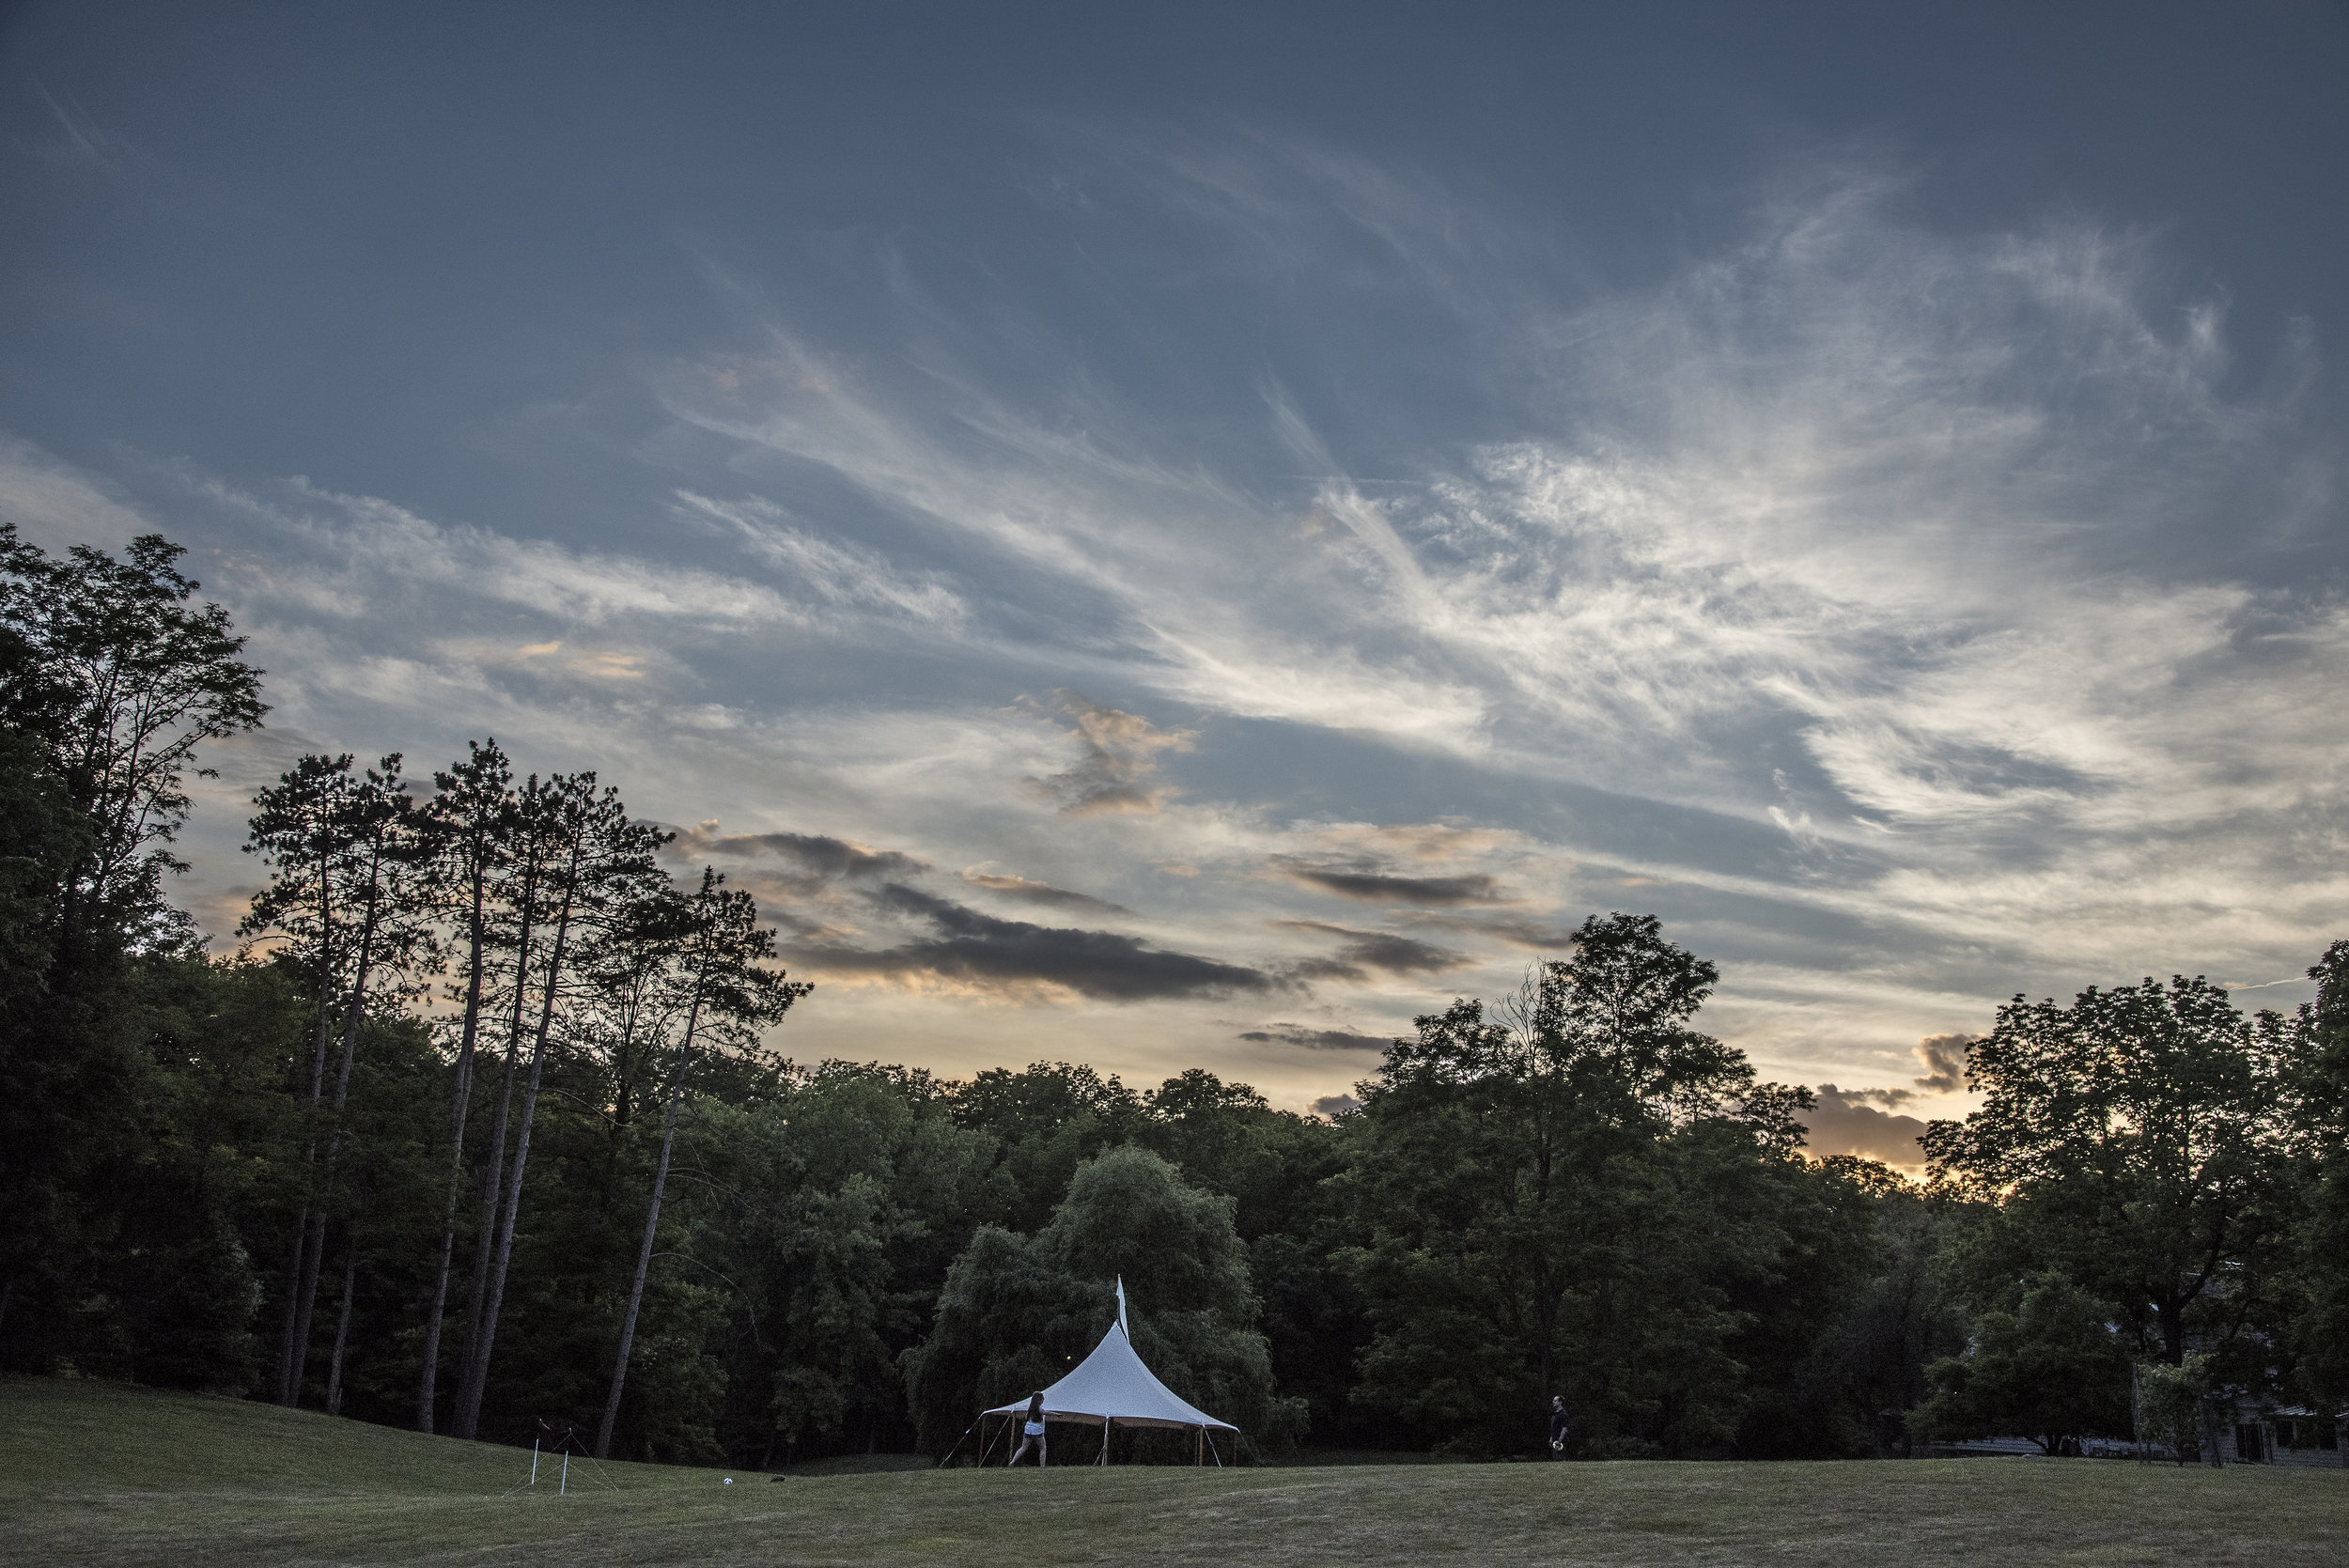 Andrea-Freeman-Events-Social-Event-Summer-Party-Rhinebeck-NY-26.JPG